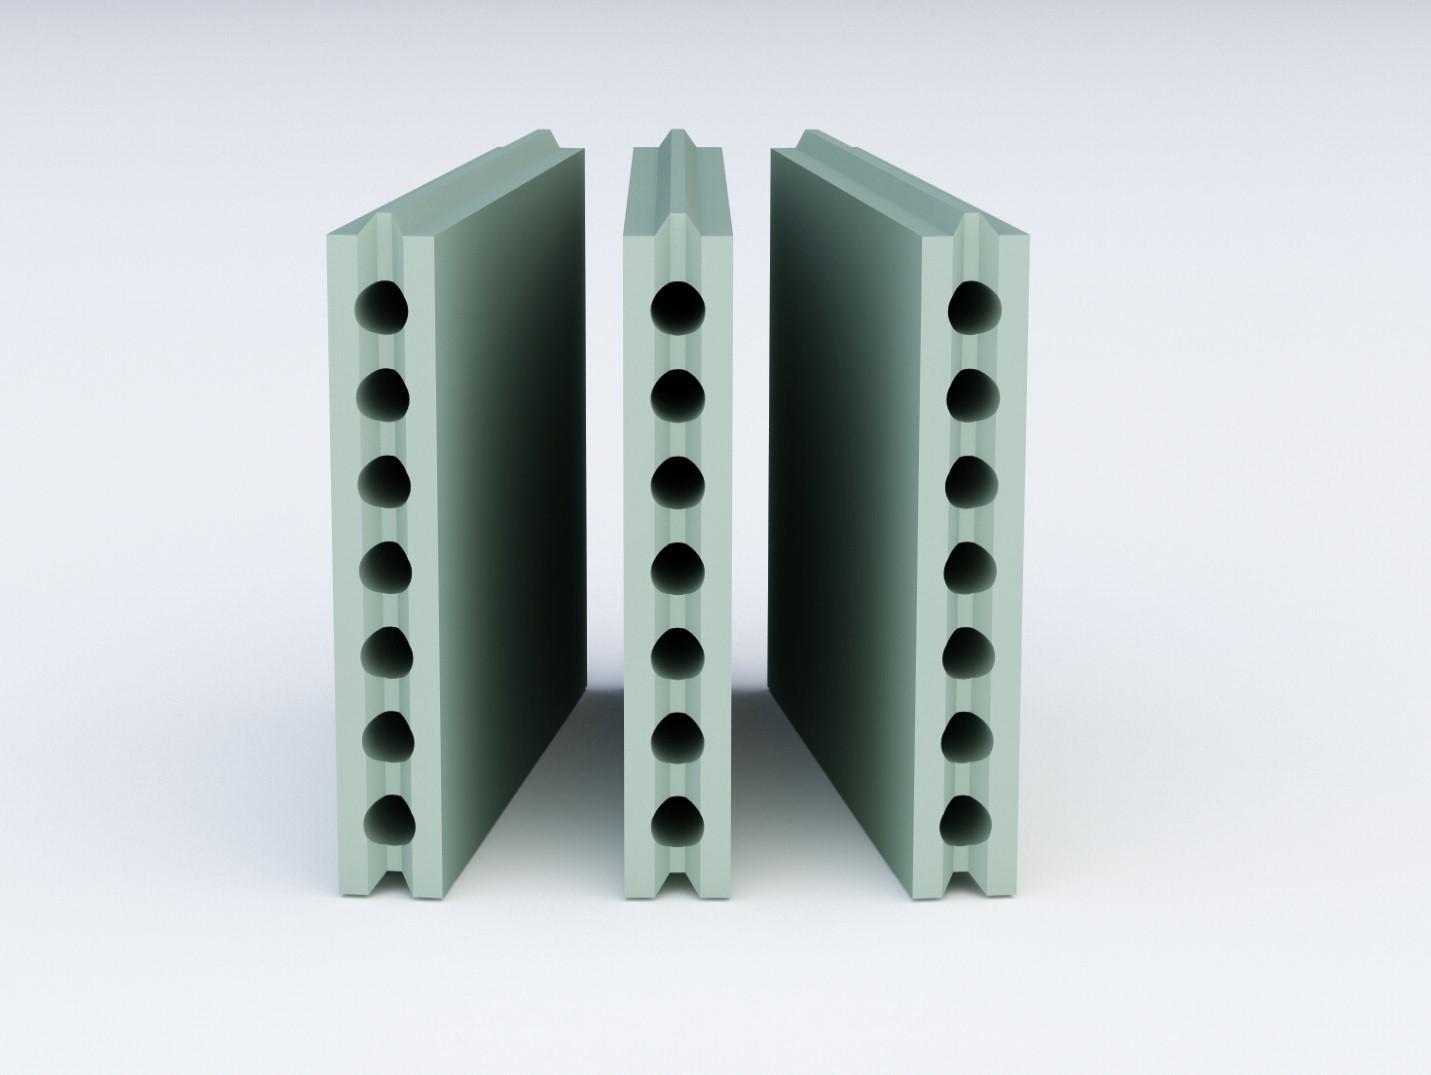 Пазогребневые блоки